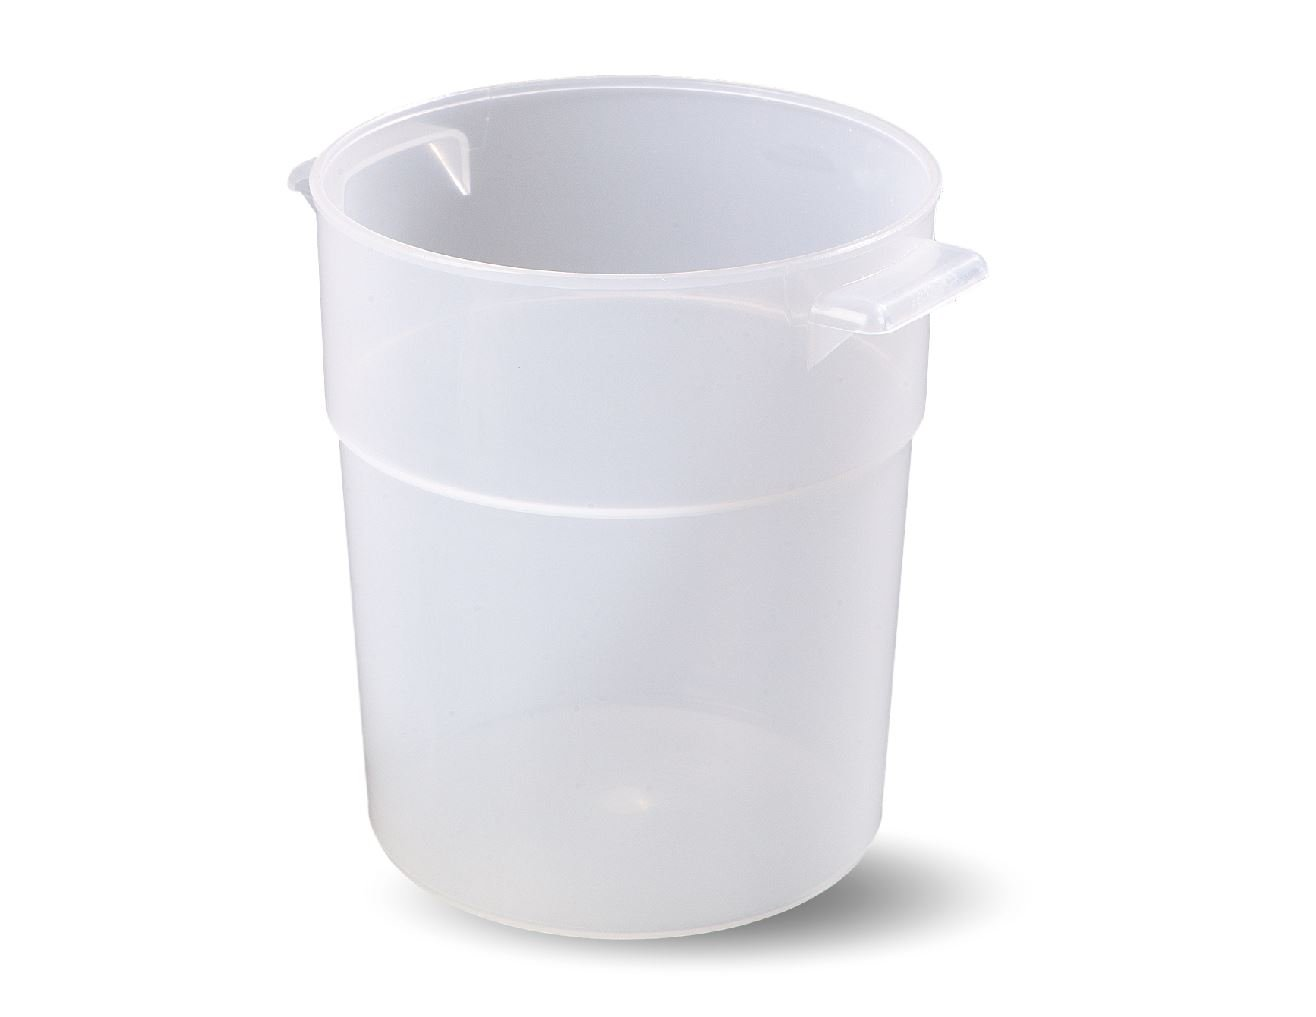 Carlisle 035530 BPA-Free Bains Marie Round Storage Container, 3.5 Quart, Clear